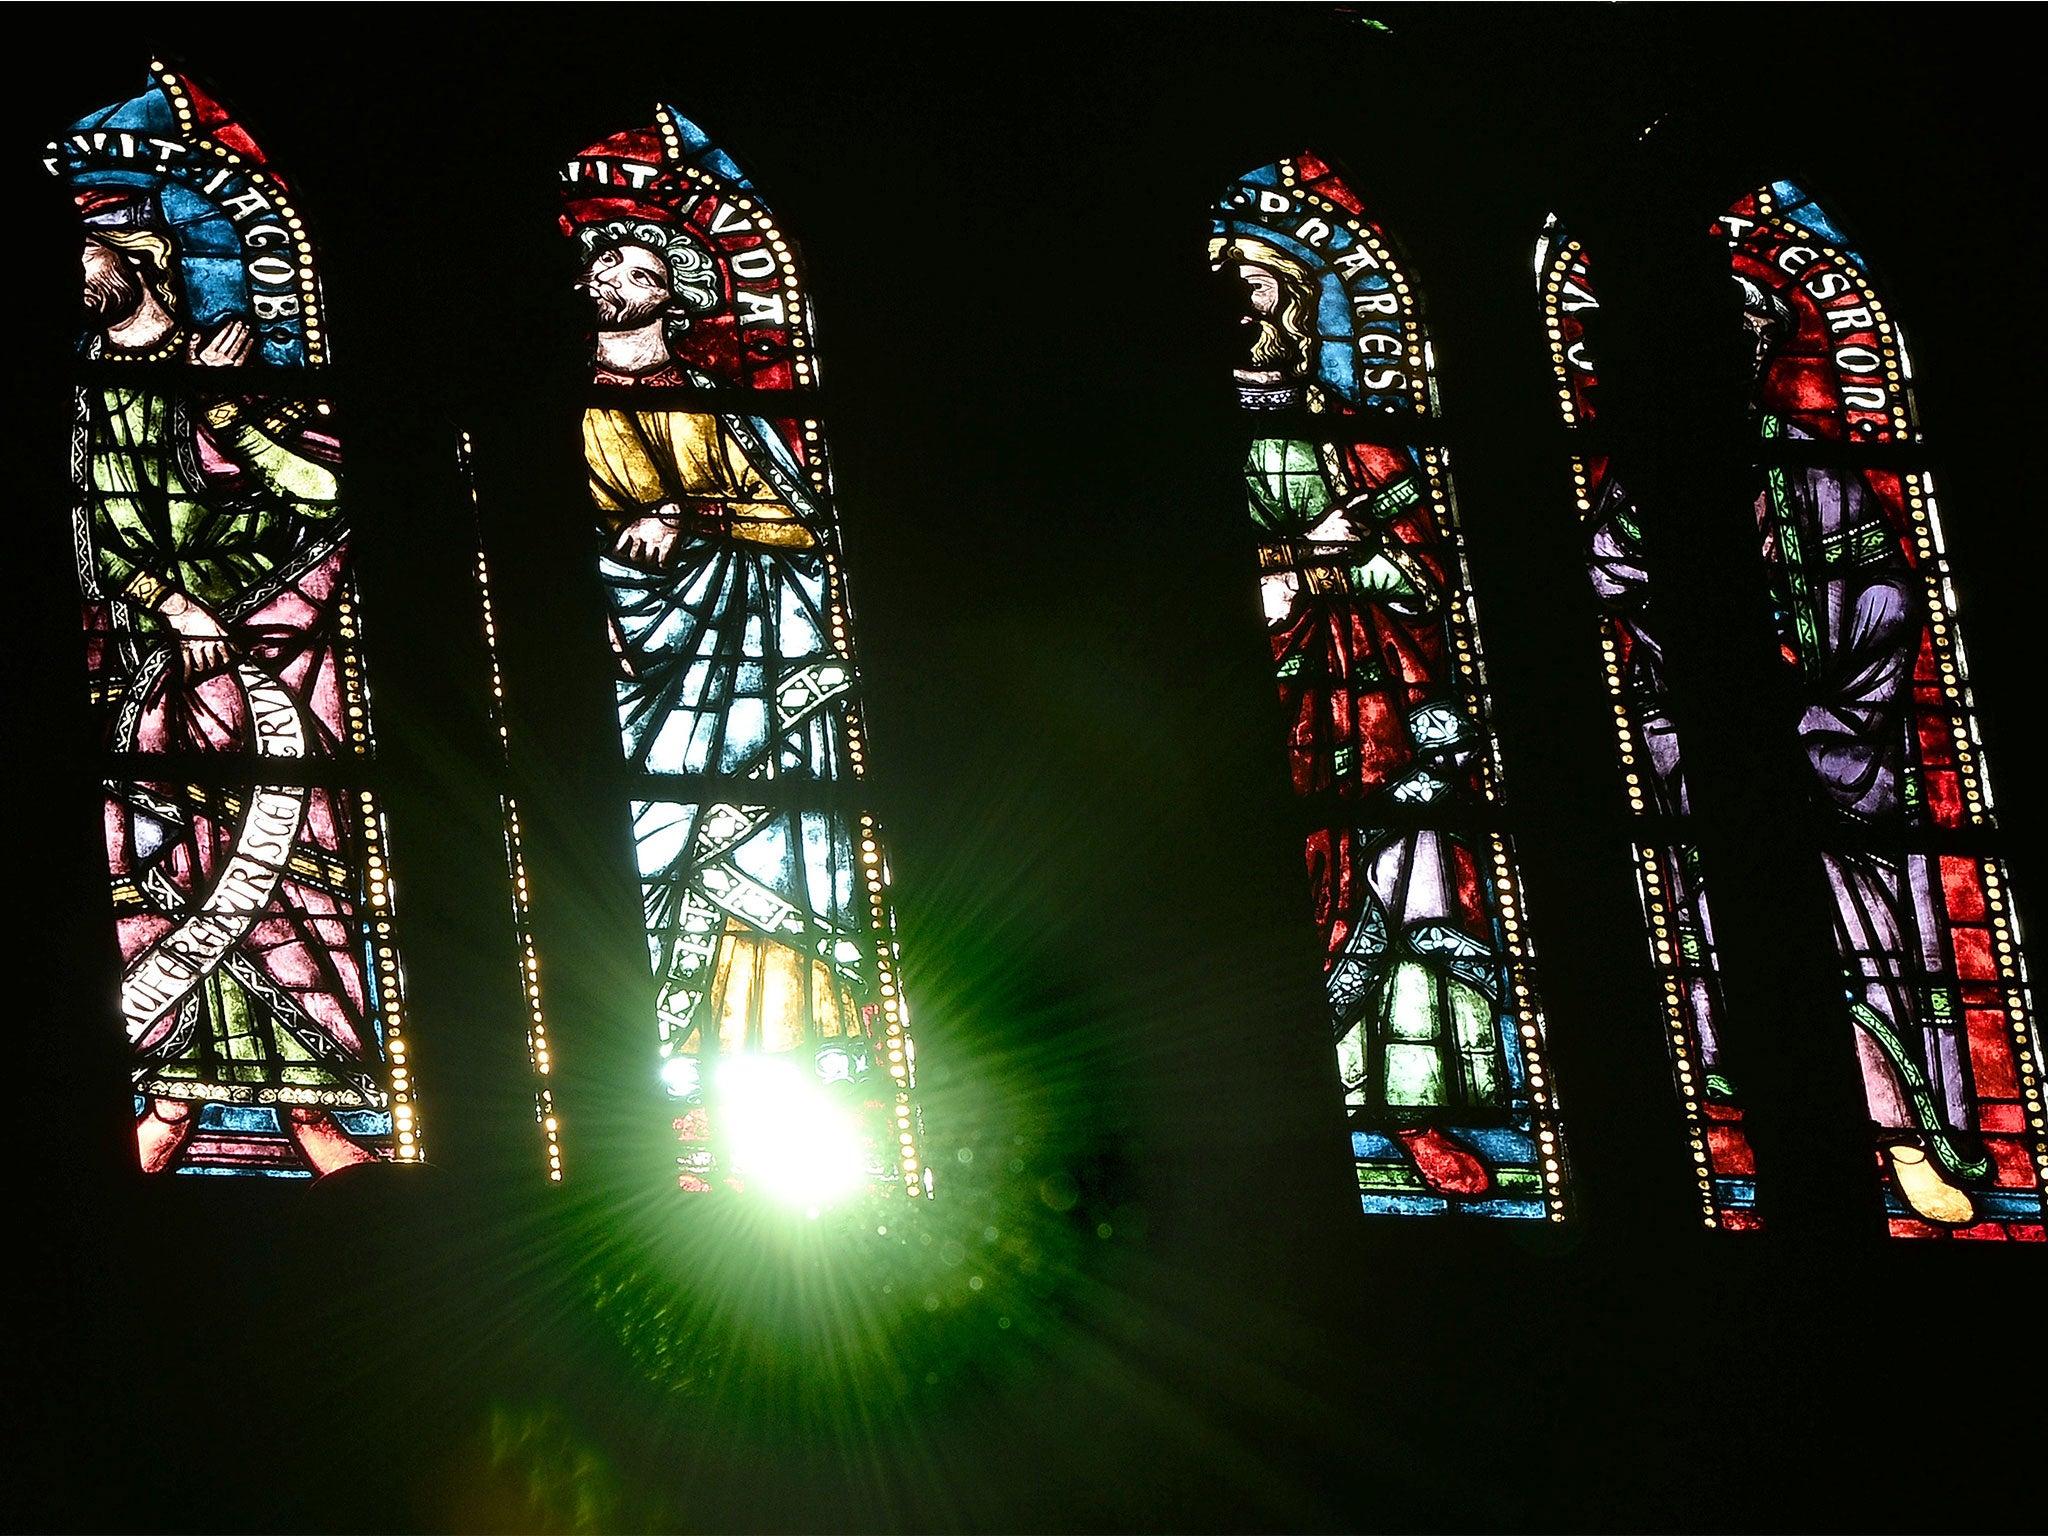 Religious segregation in faith schools is 'dreadful' says catholic leader